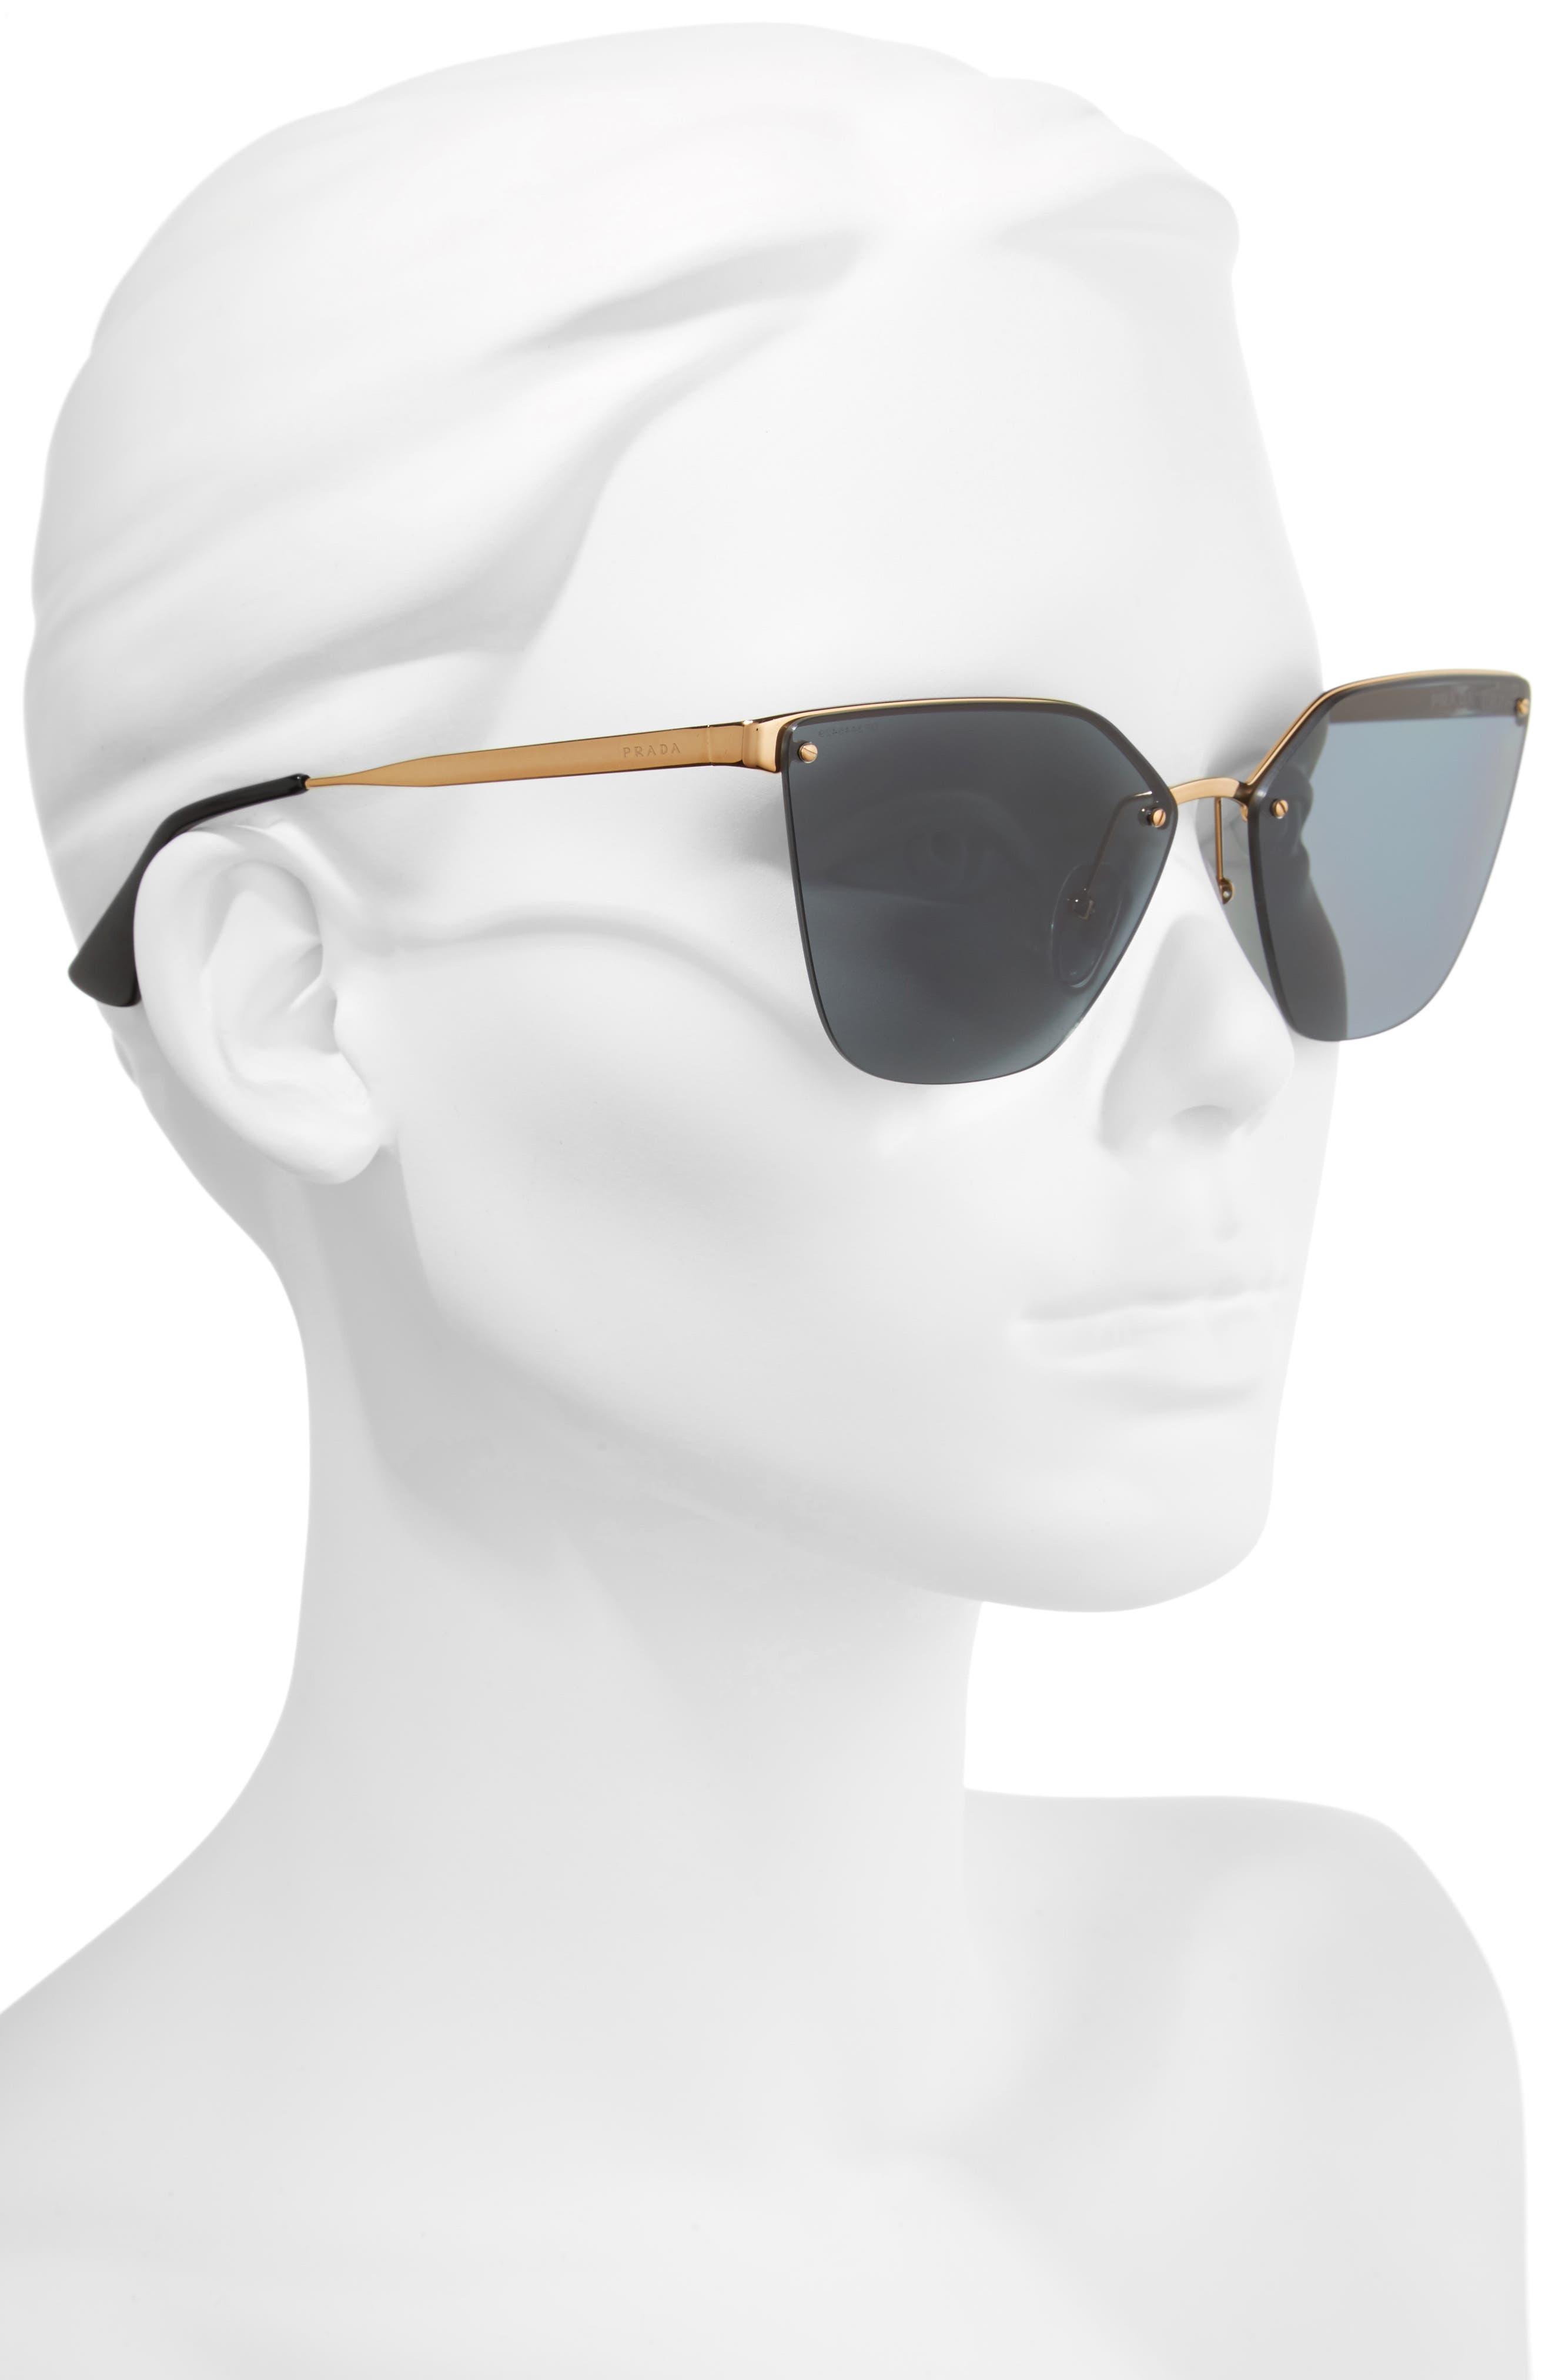 63mm Oversize Rimless Sunglasses,                             Alternate thumbnail 2, color,                             Black/ Green